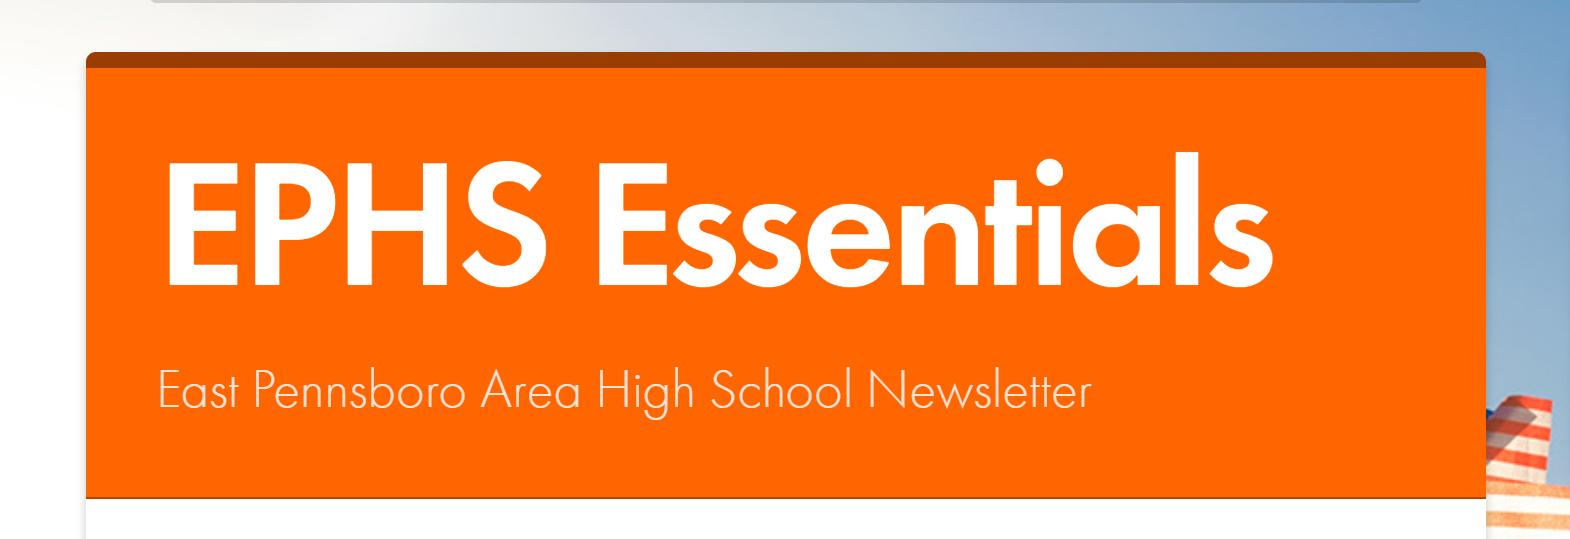 ephs essentials